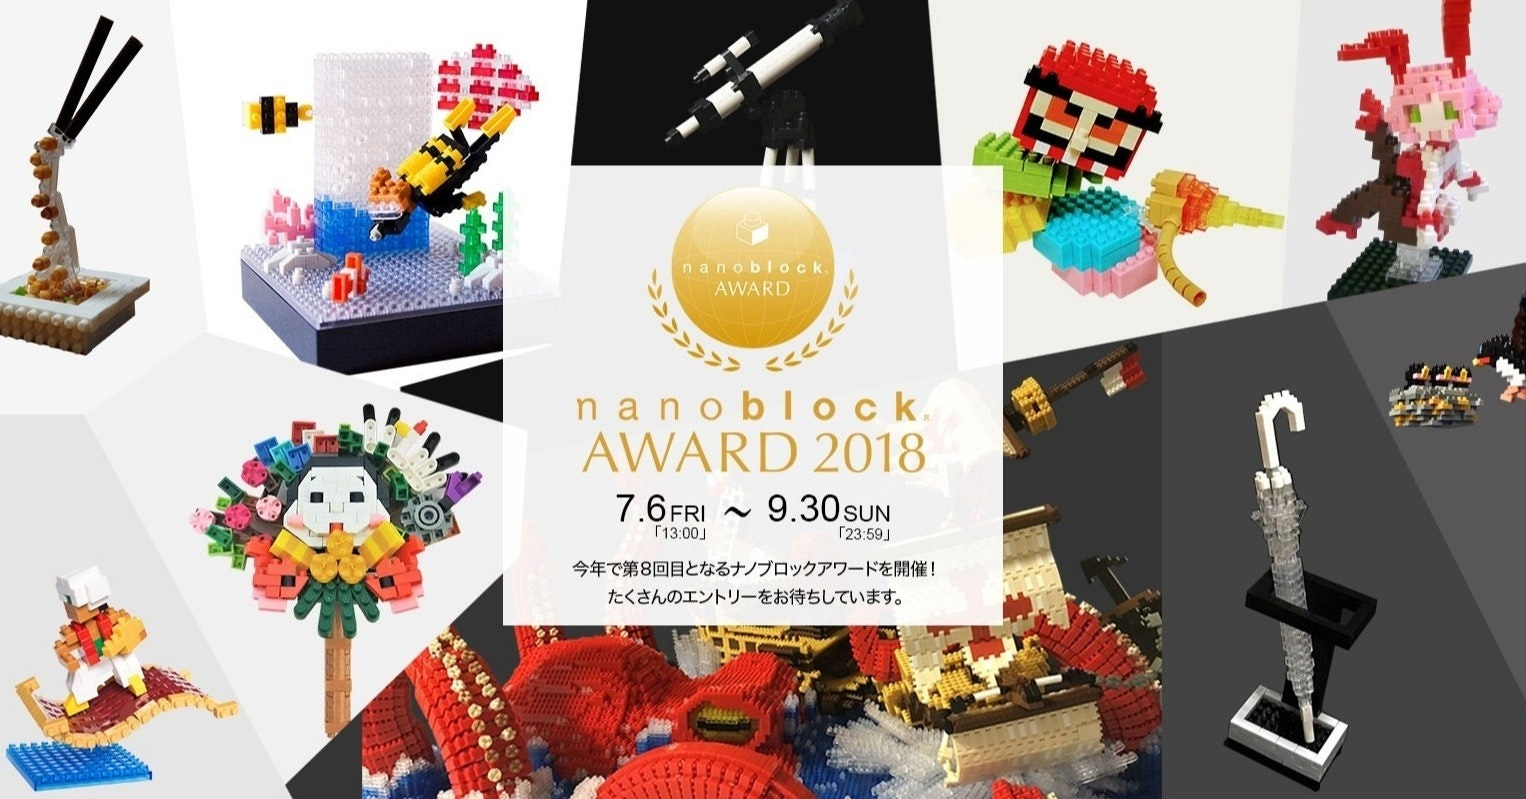 Nanoblock, Kawada, ダイヤブロック, Construction set, Toy, Shinjuku, Product, Illustration, Graphic design, Başkan, Nanoblock, product, graphic design, art, advertising, illustration, graphics, recreation